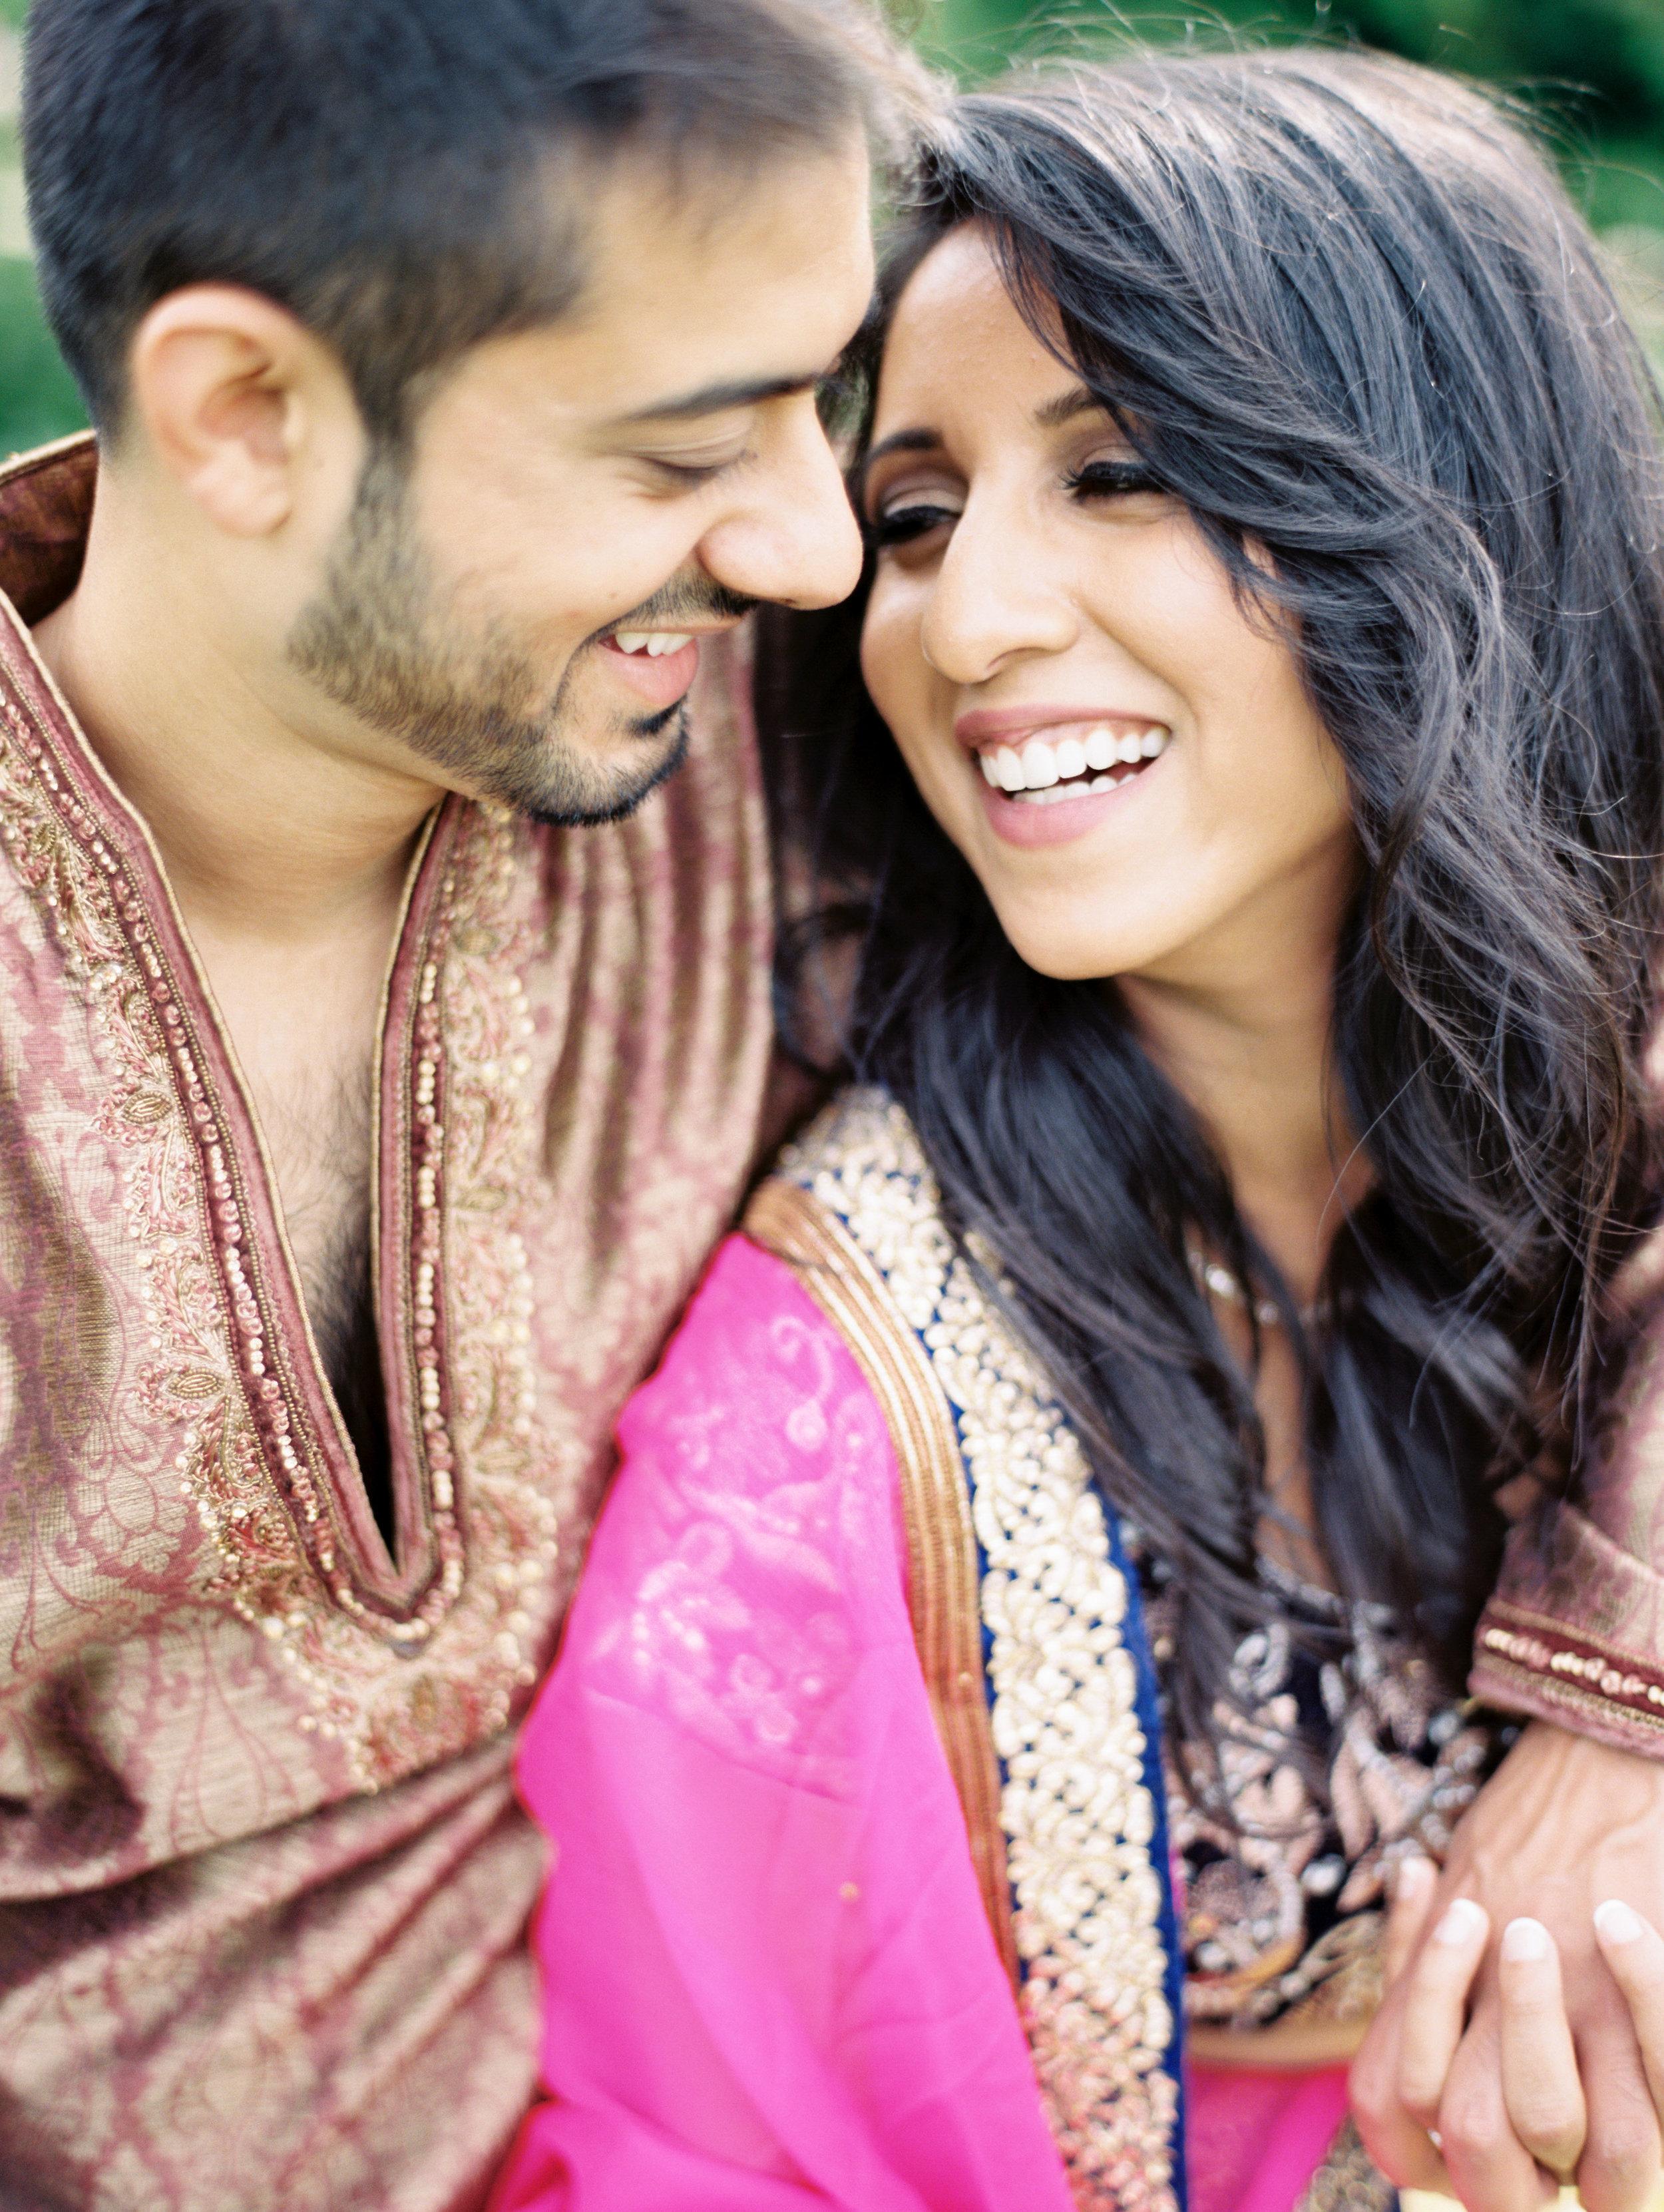 Priya & SHivon | Engagement